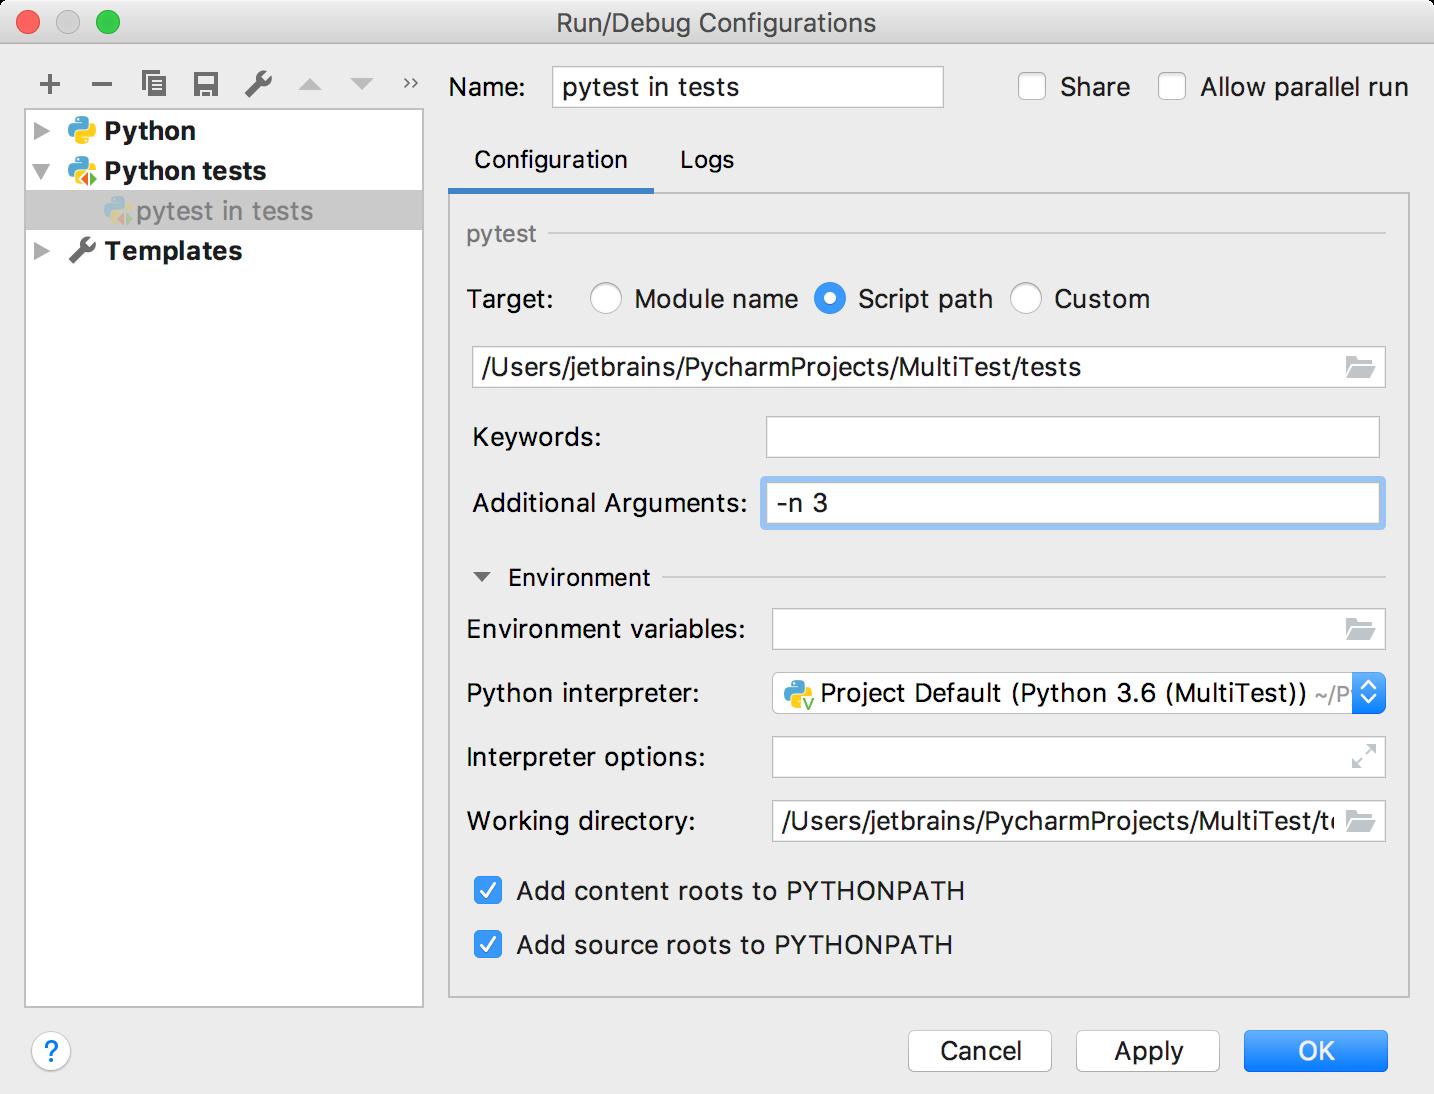 Editing Run/Debug configuration for a group of pytest tests